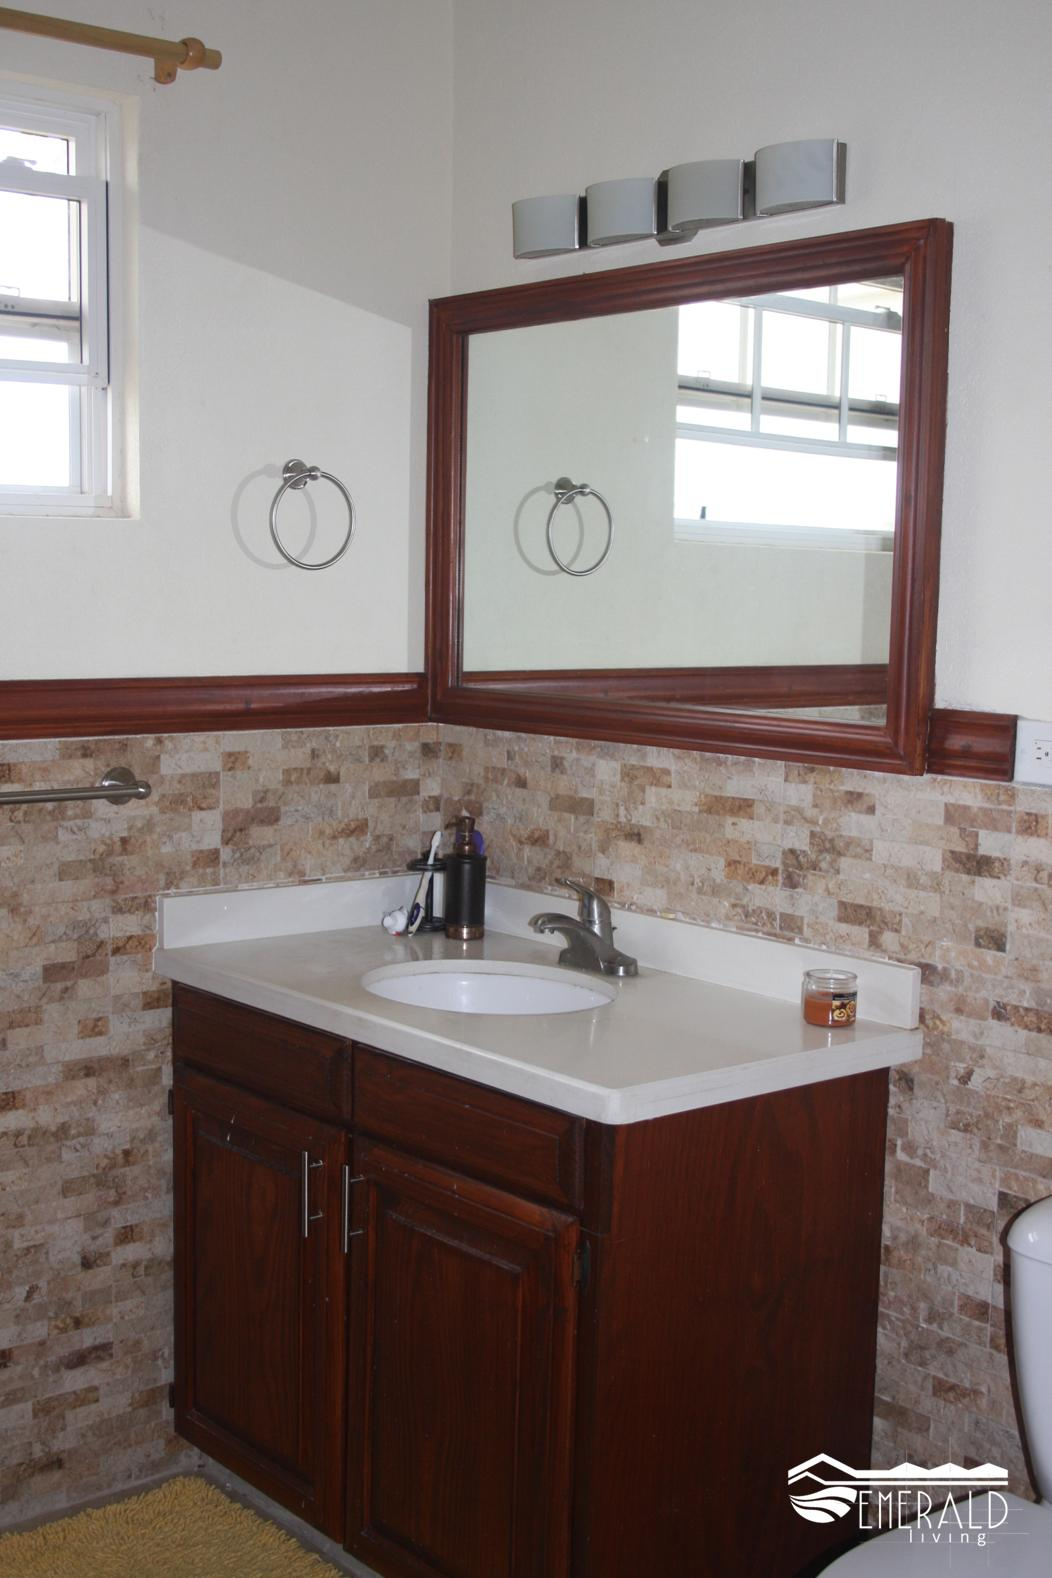 EMERALD LIVING | Upstairs Bathroom